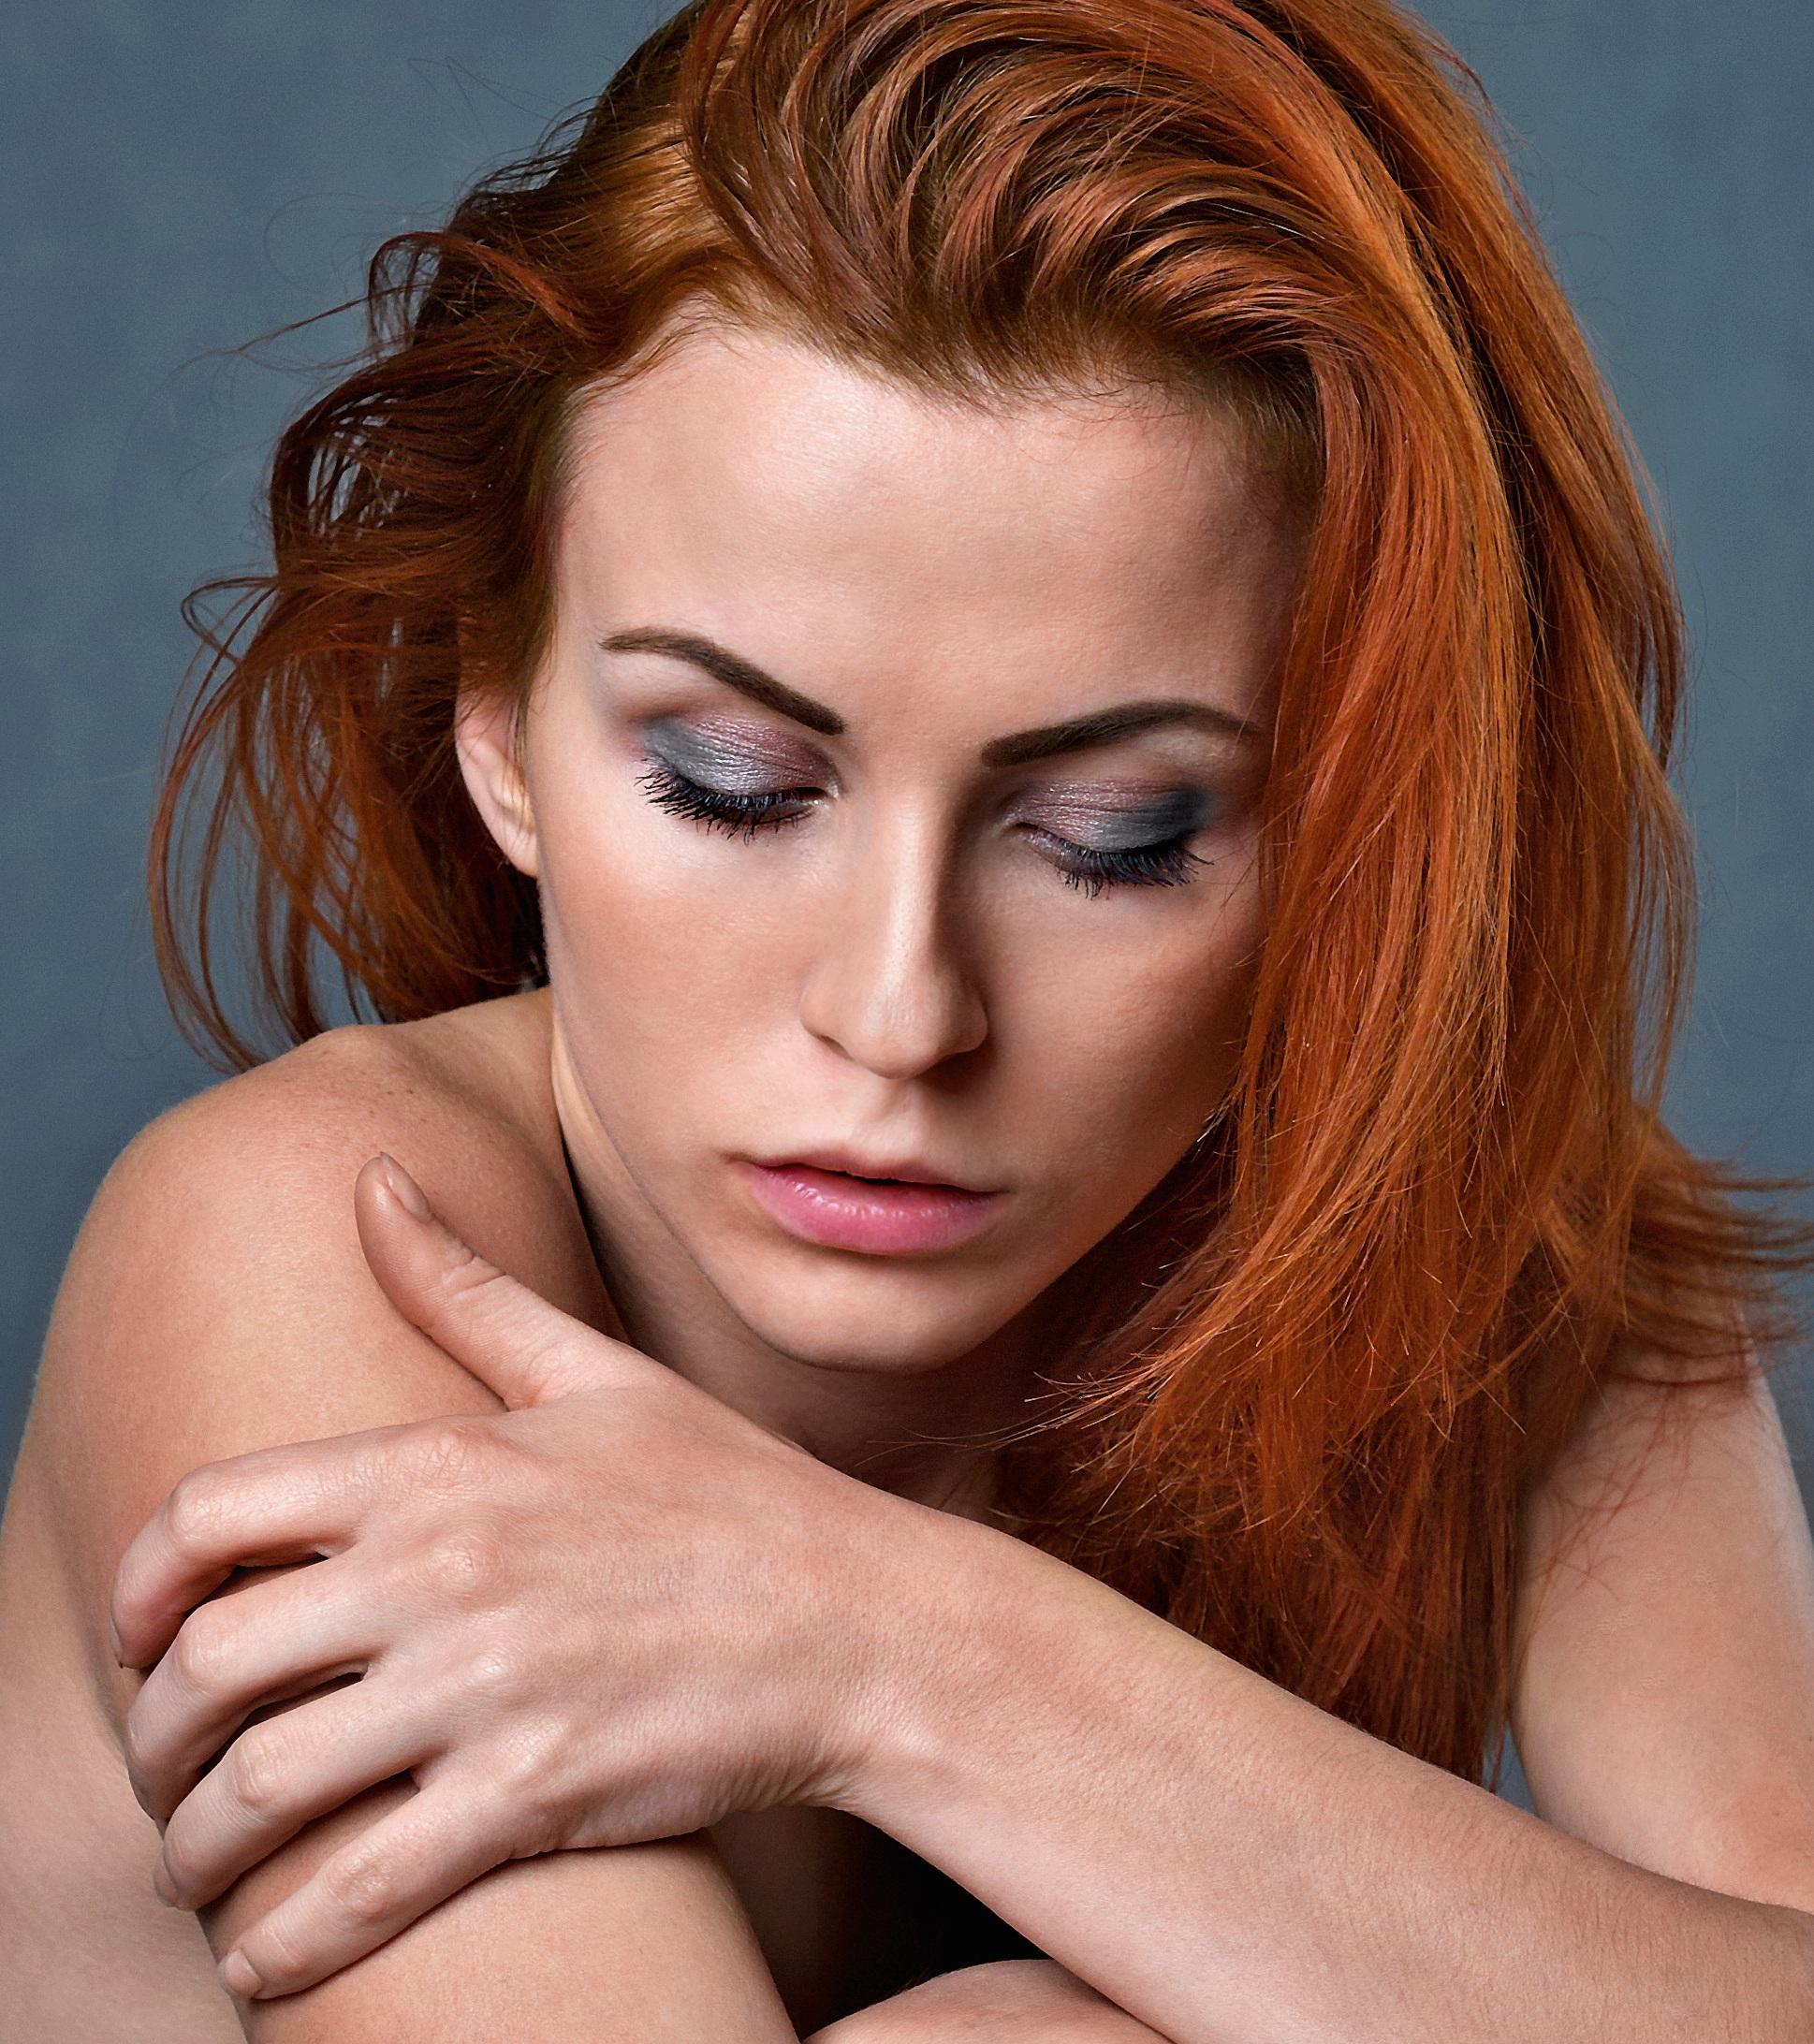 Kostenlose foto Person Frau Porträt Modell Mode Frisur